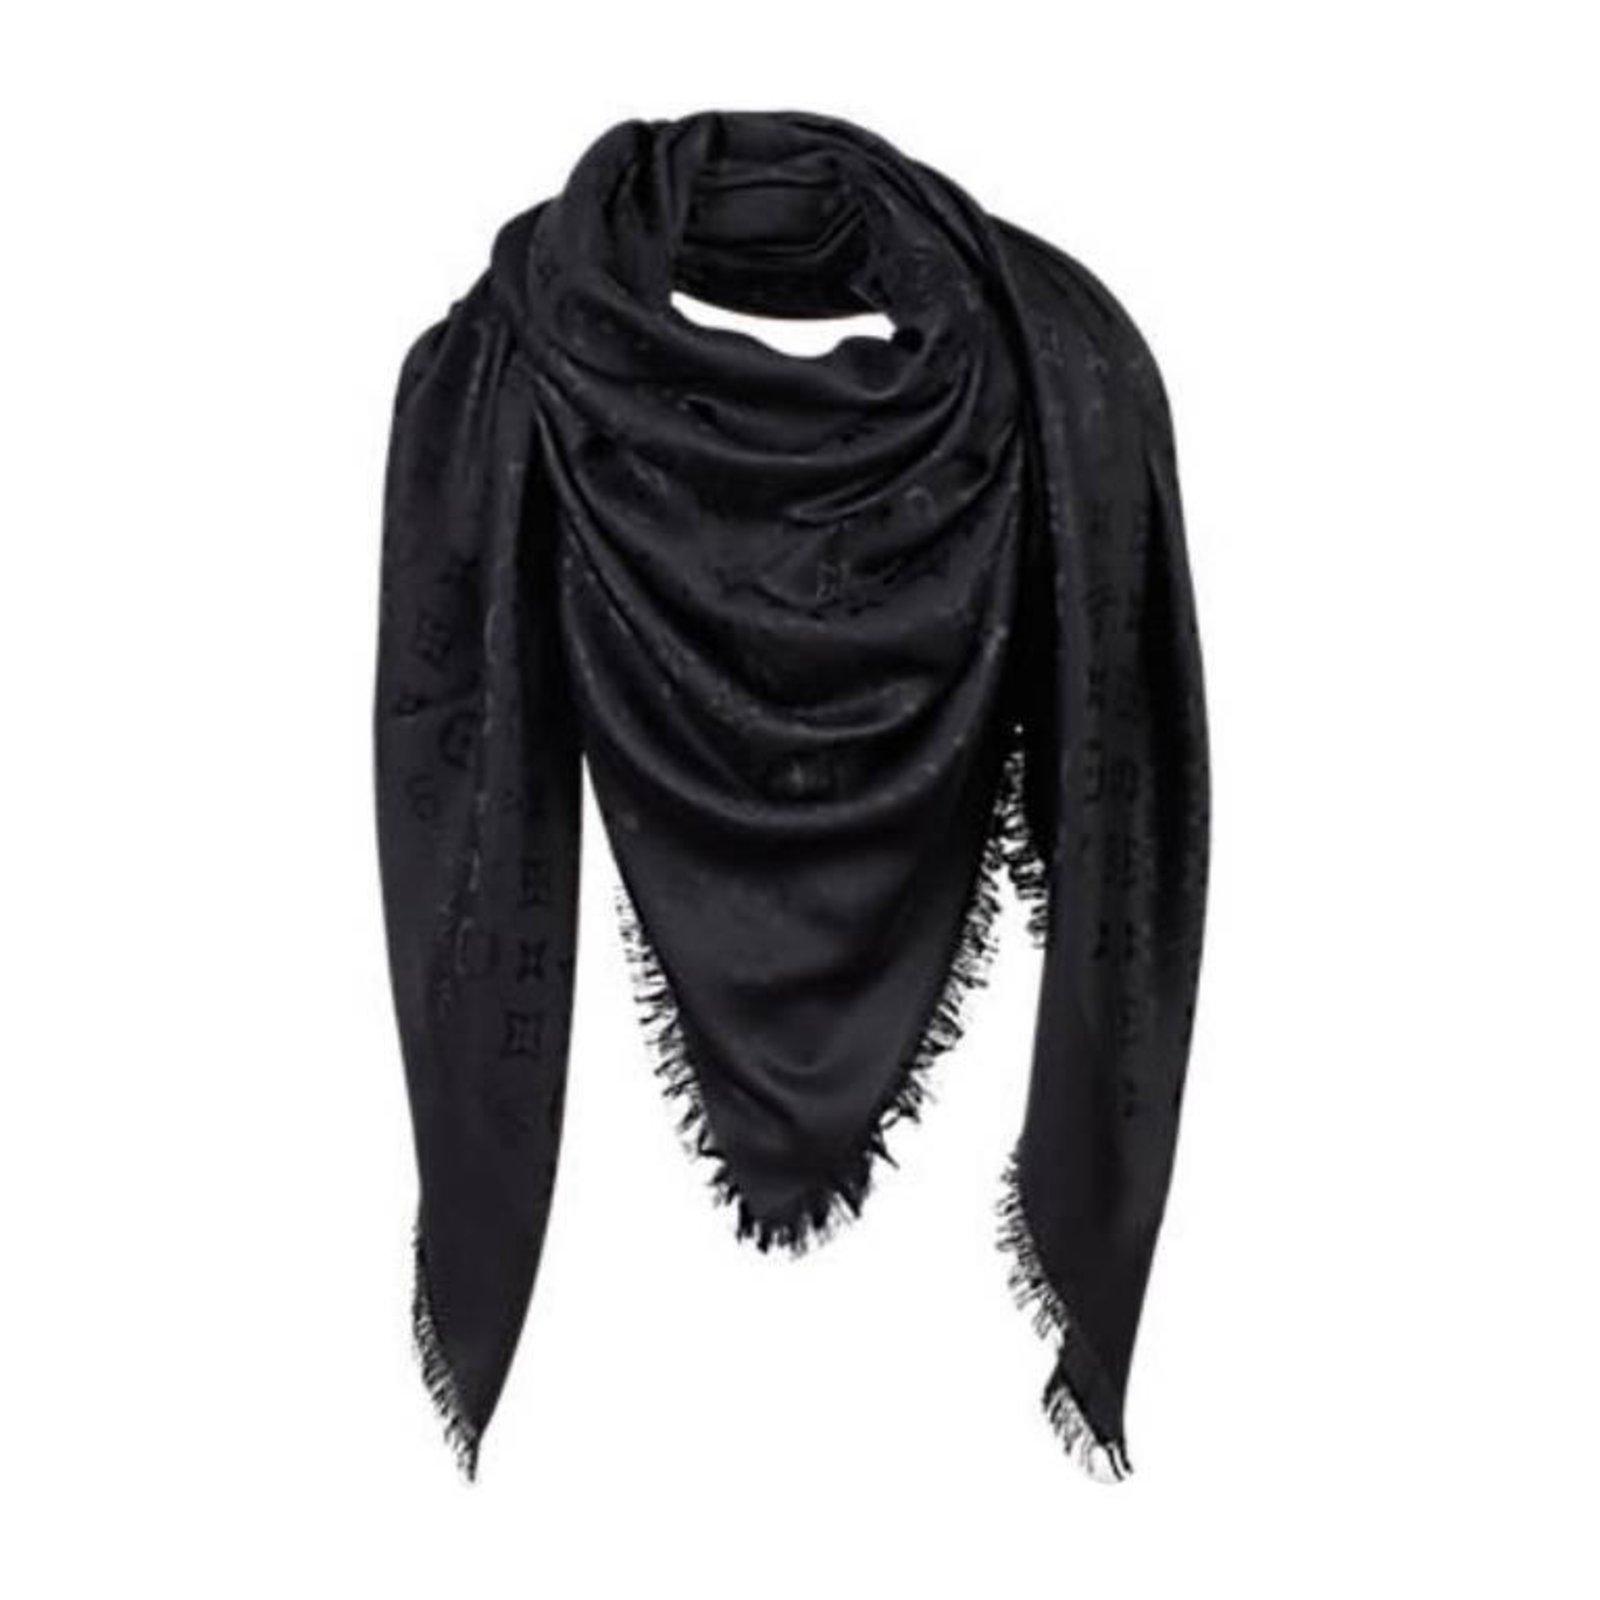 Foulards Louis Vuitton Foulard Monogramme Soie Noir ref.57900 - Joli ... 7df0cd7a741